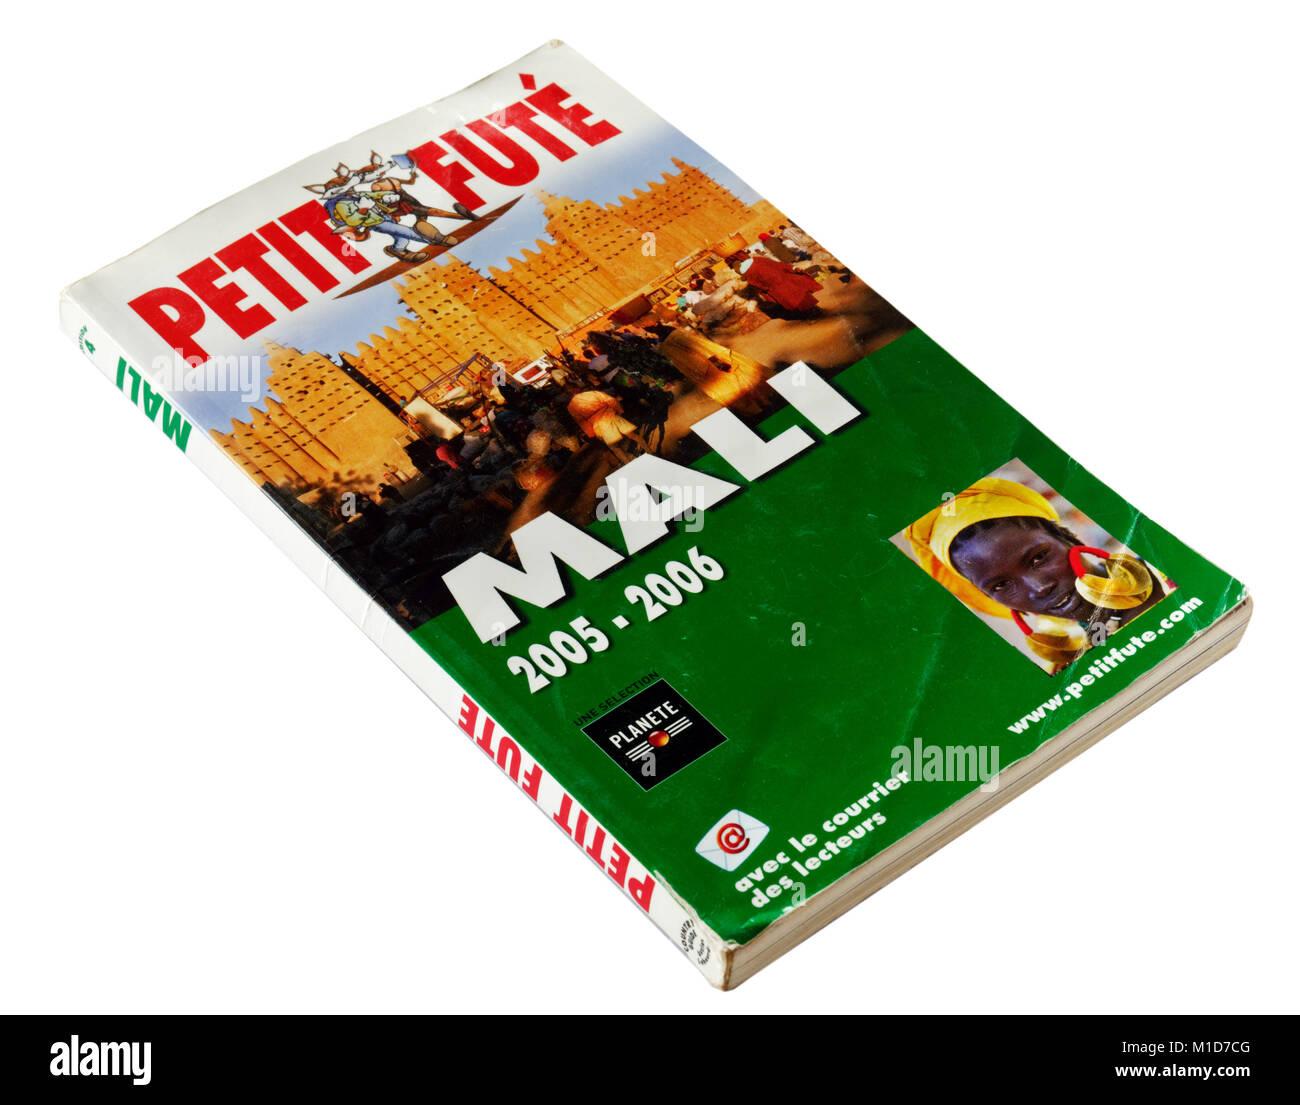 The Petit Futé guide to Mali - Stock Image